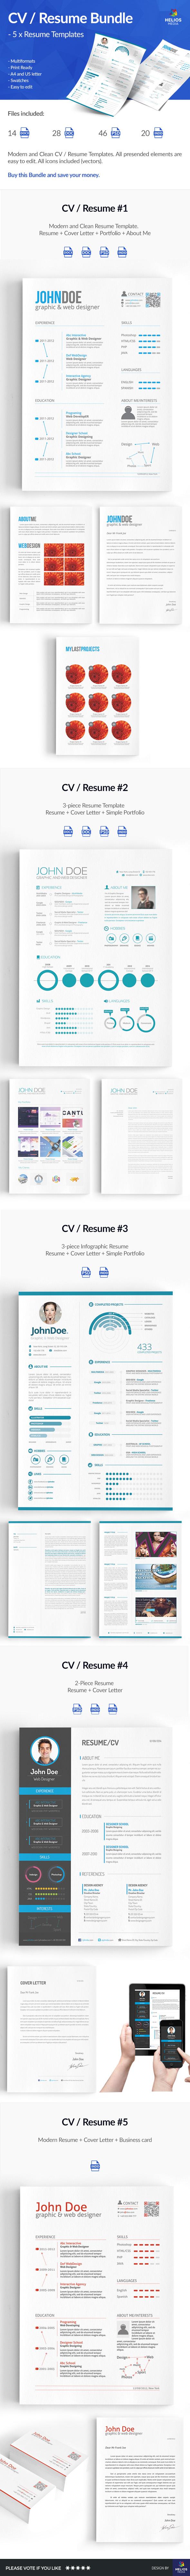 CV Resume template photoshop InDesign cover letter Work  portfolio clean